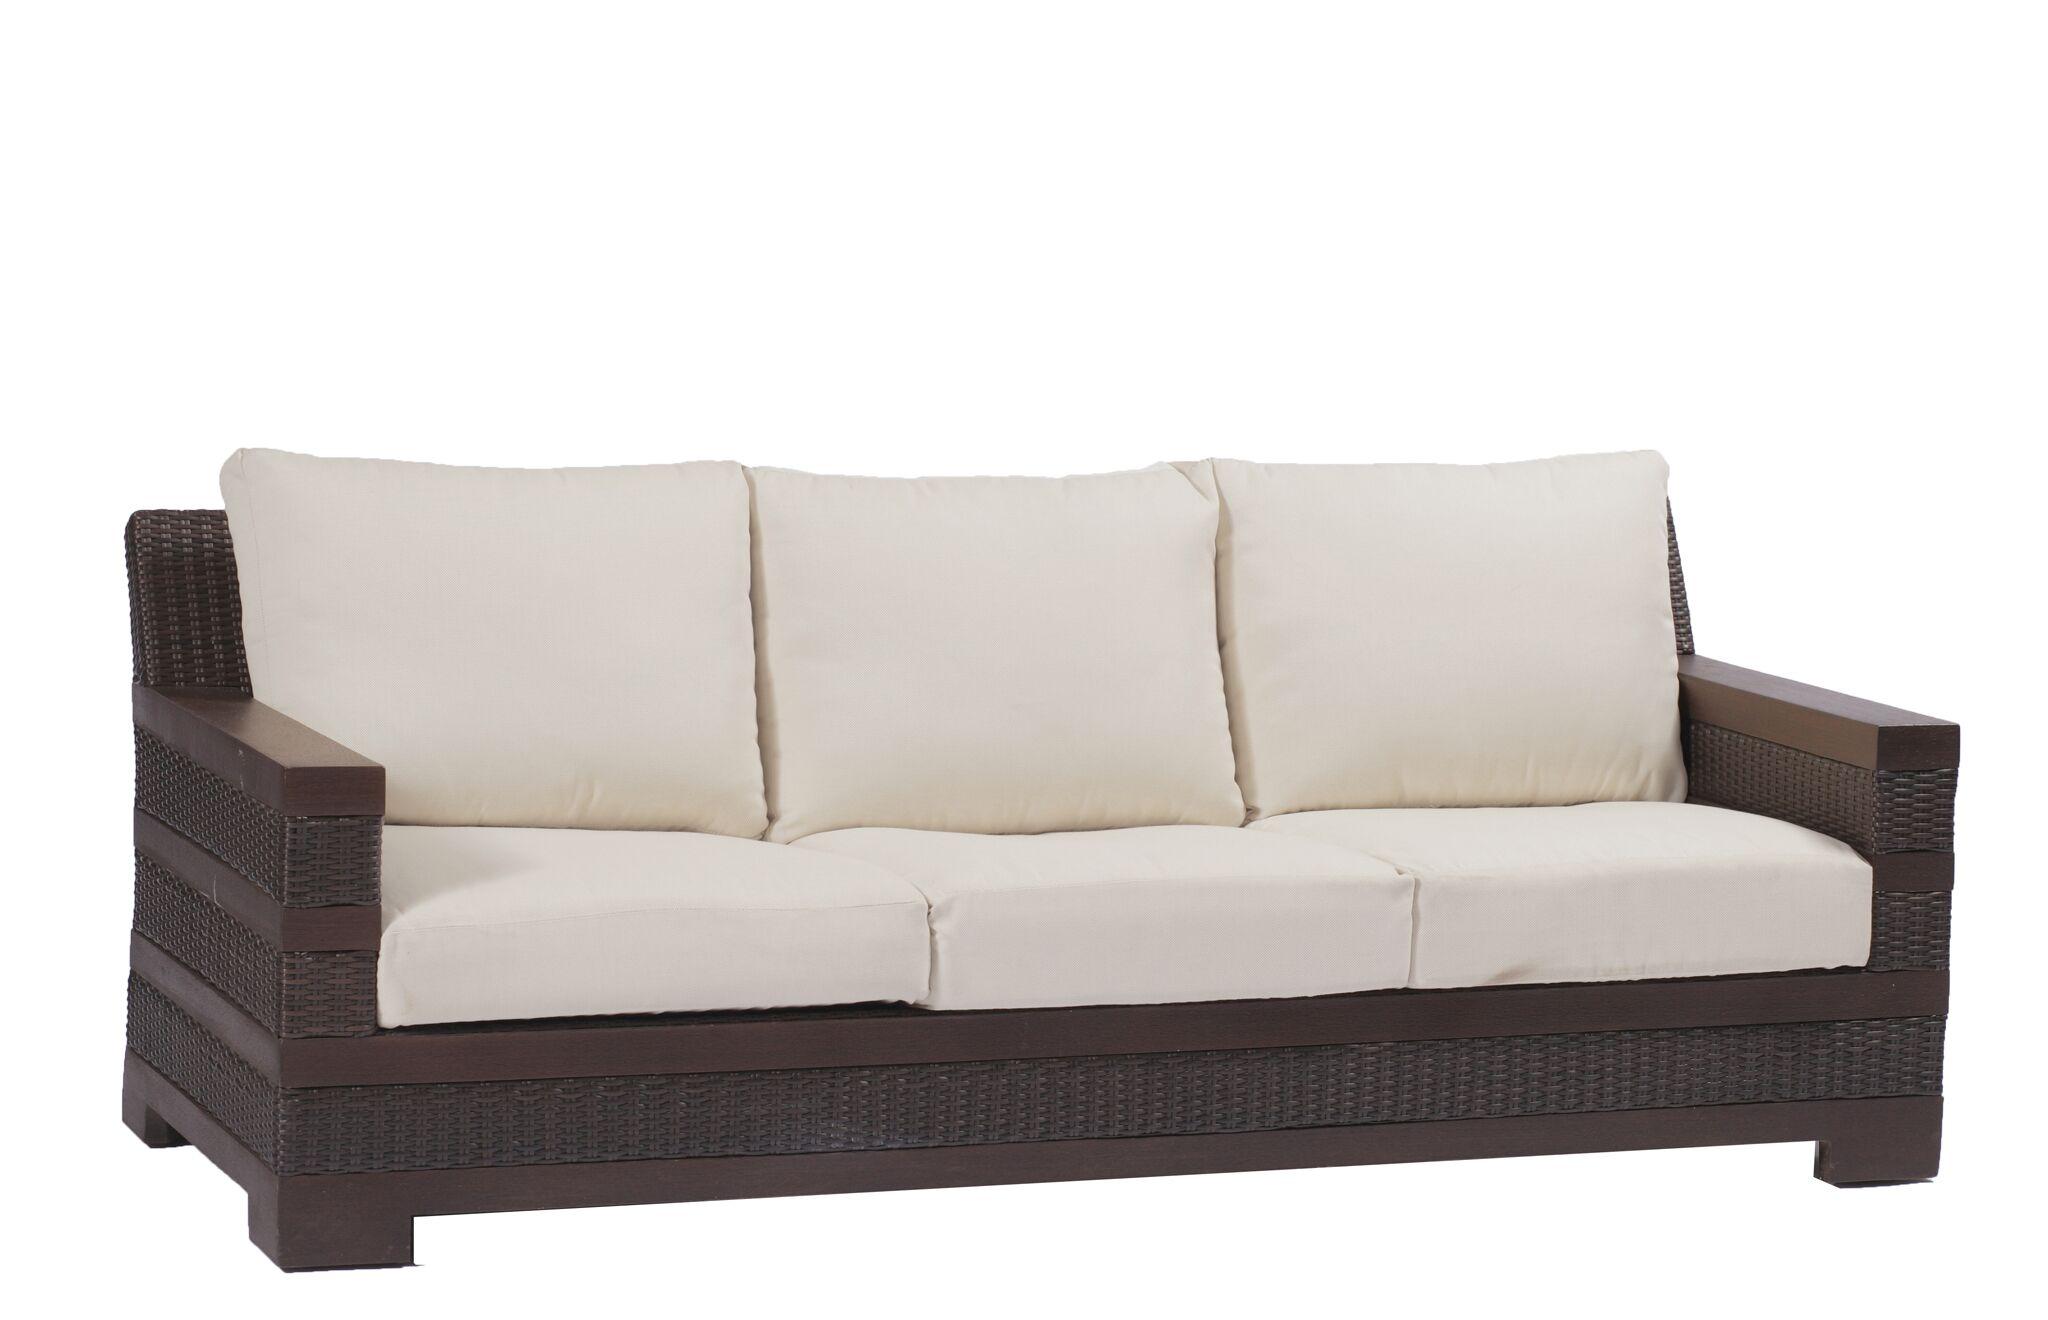 Sierra Patio Sofa with Cushions